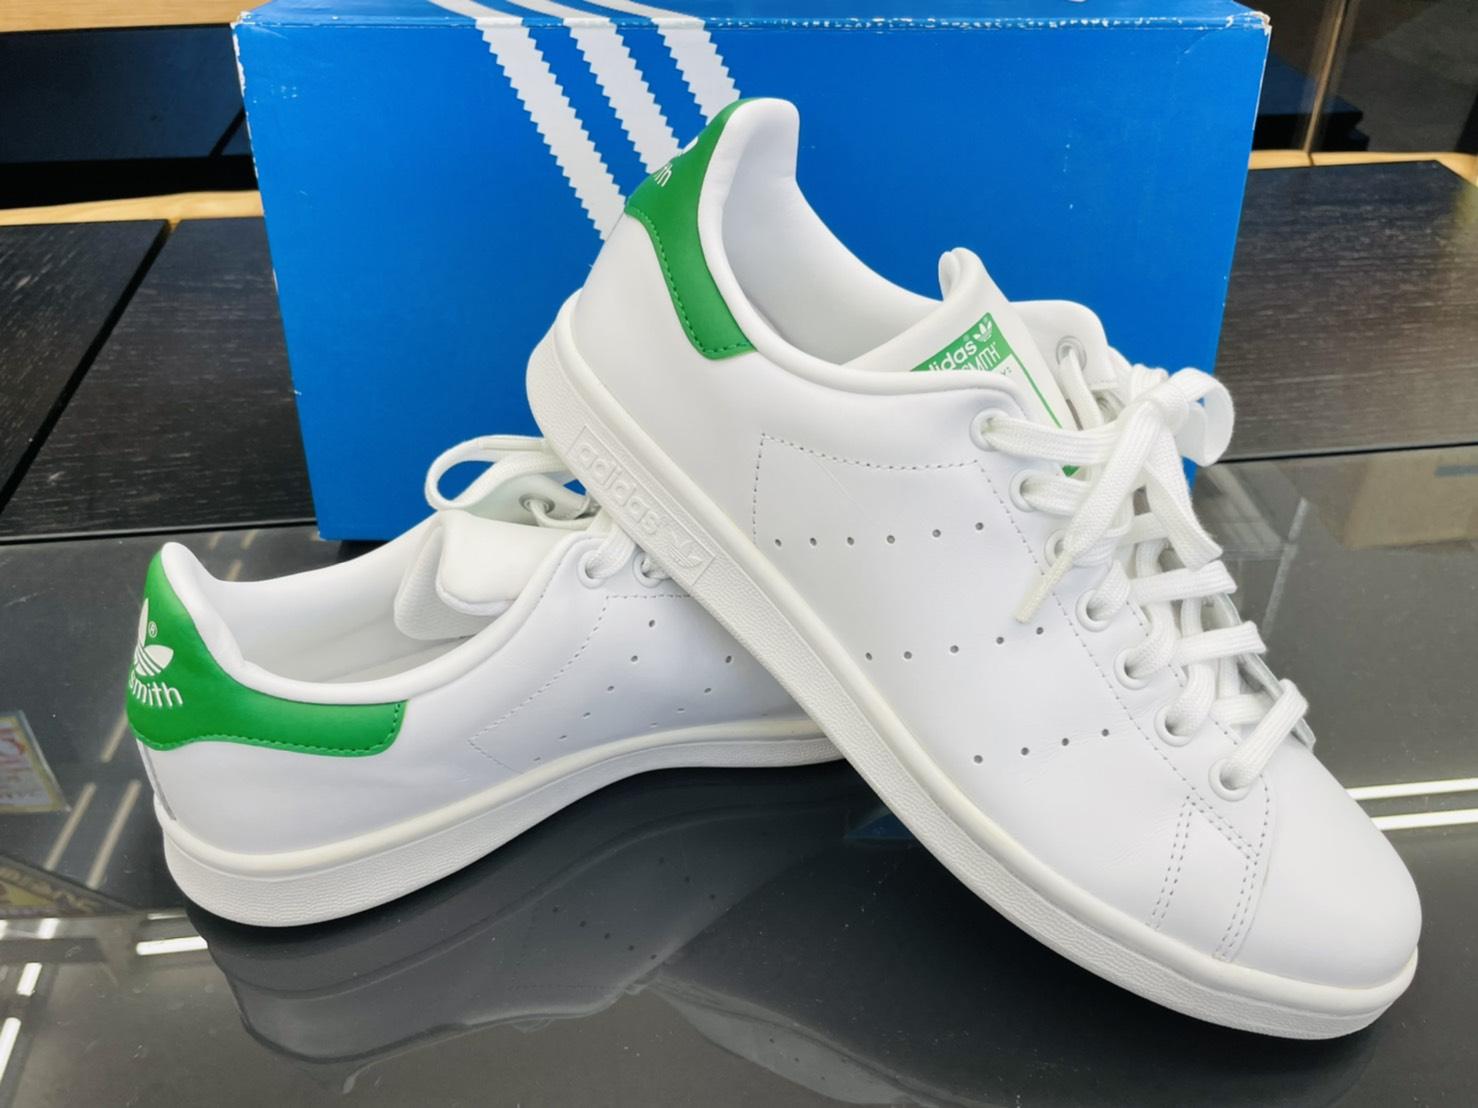 【adidas(アディダス) / STAN SMITH(スタンスミス)スニーカー / ホワイトグリーン 】買い取りさせて頂きました!!の買取-